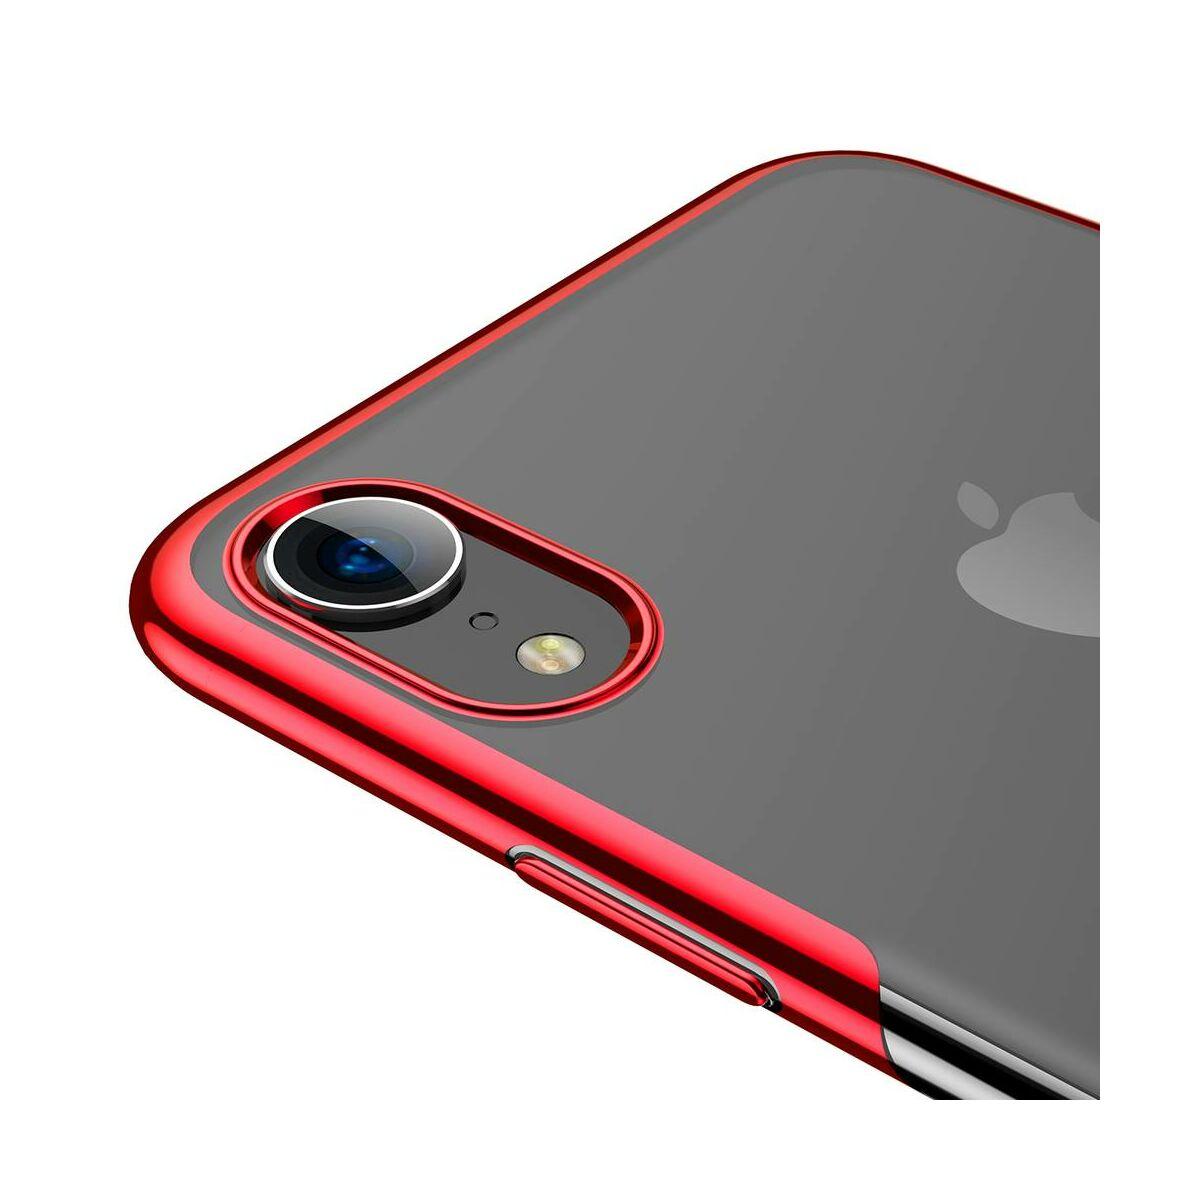 Baseus iPhone XR tok, Shining, piros (ARAPIPH61-MD09)